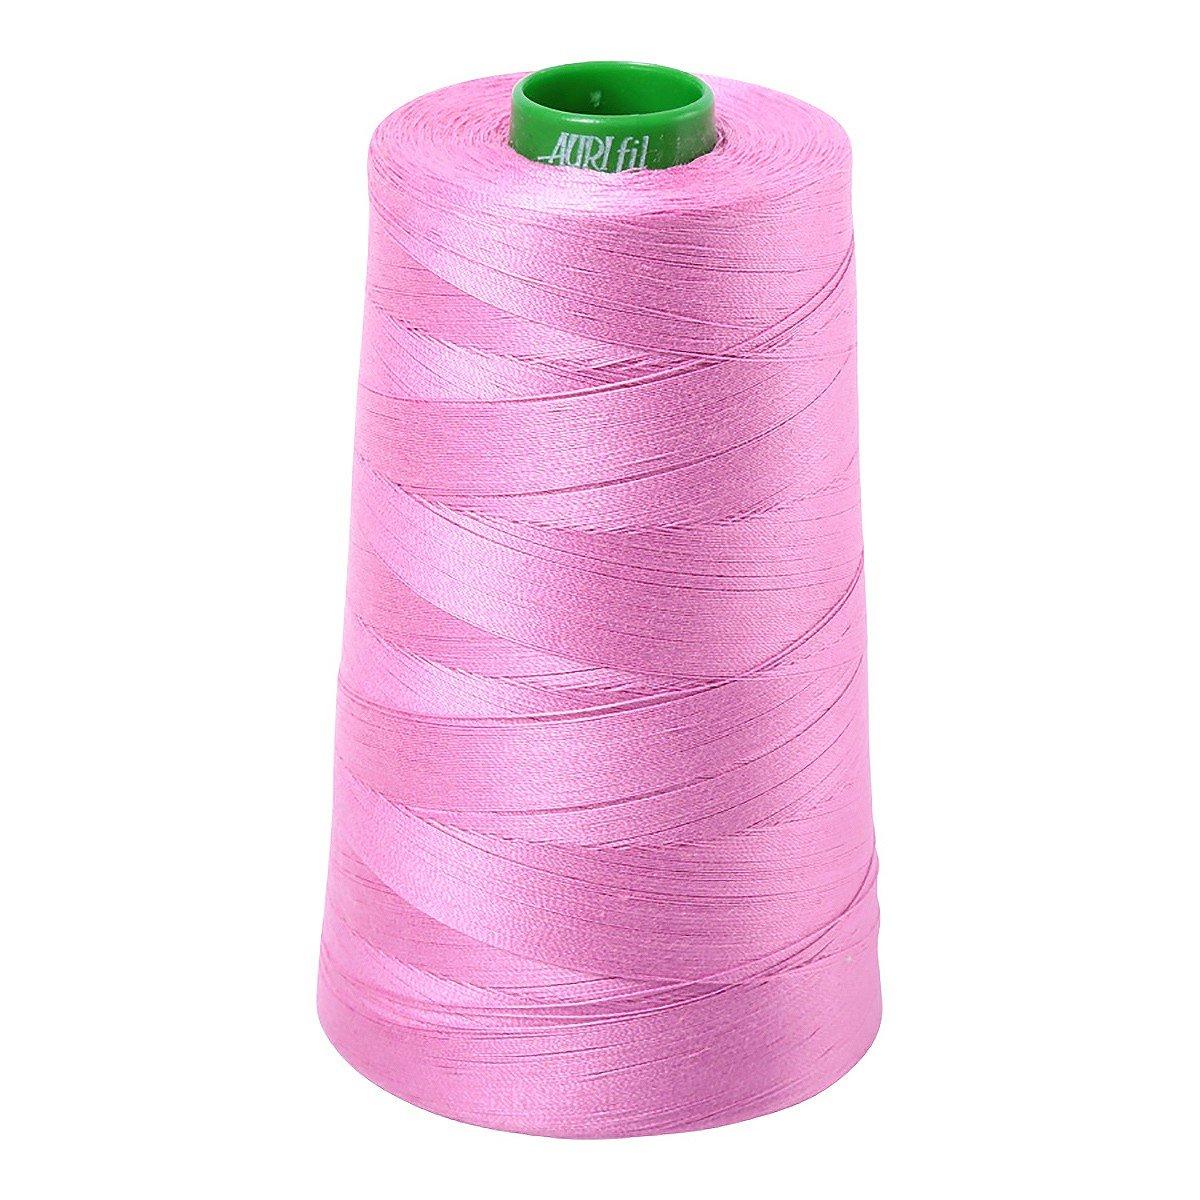 Mako (Cotton) Embroidery Thread 40wt 5140yds Medium Orchid